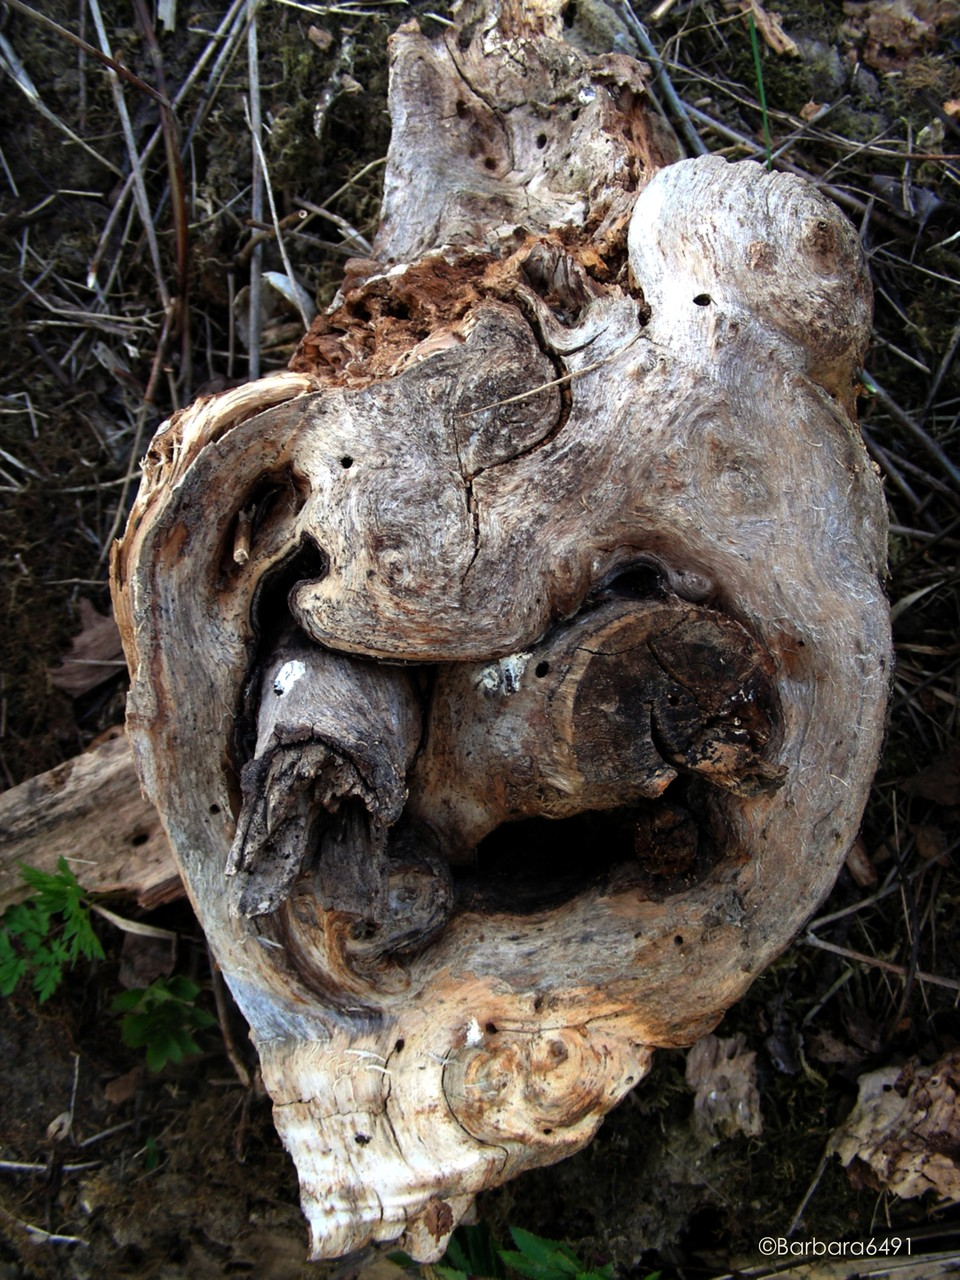 Draculas vom Holzpflock ddurchbohrtes Herz